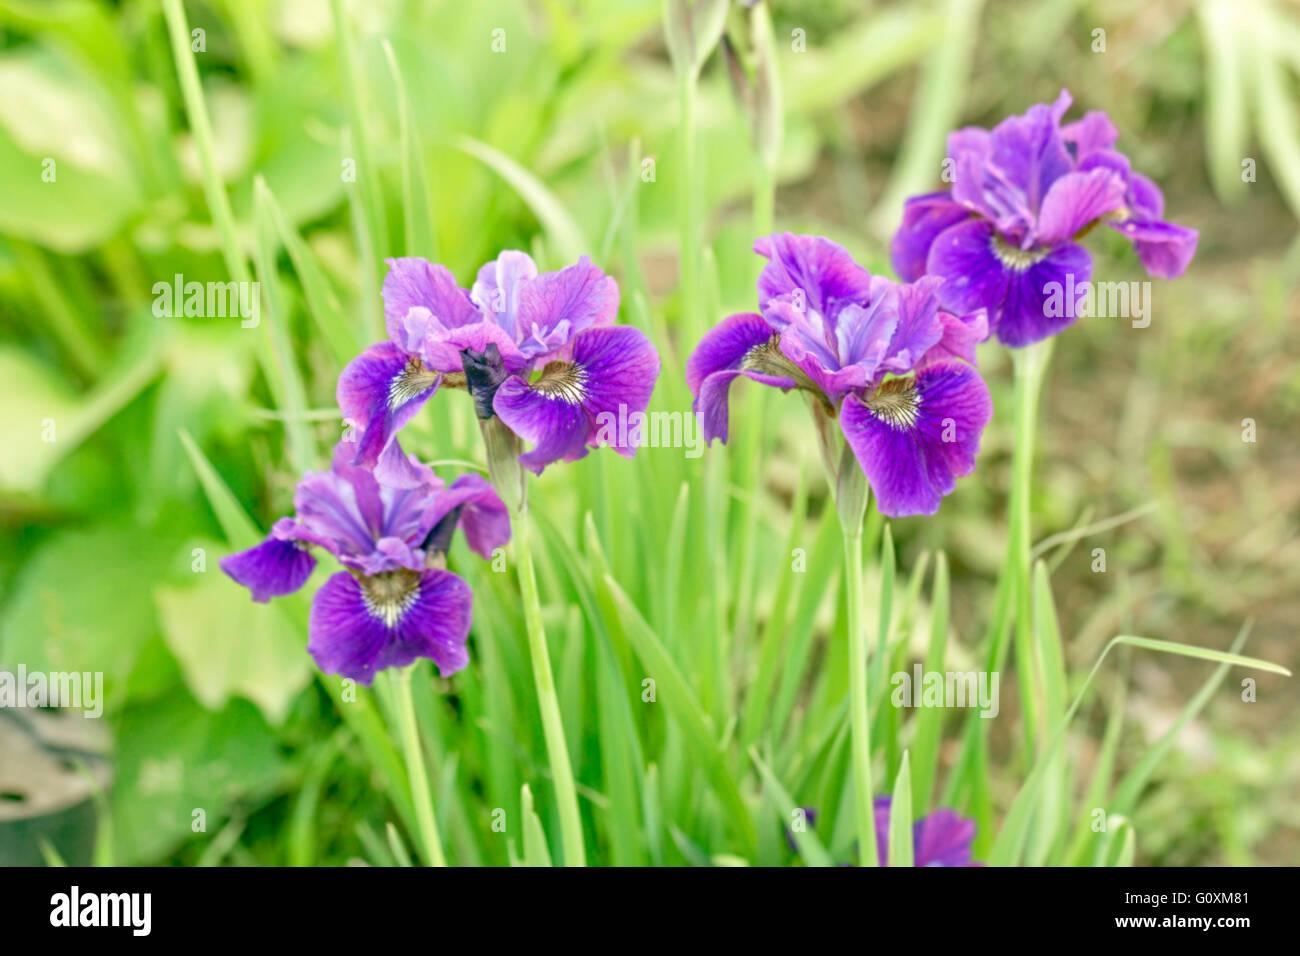 Wonderful world of flowers stock photos wonderful world of flowers beauty purple irises in green summer garden stock image izmirmasajfo